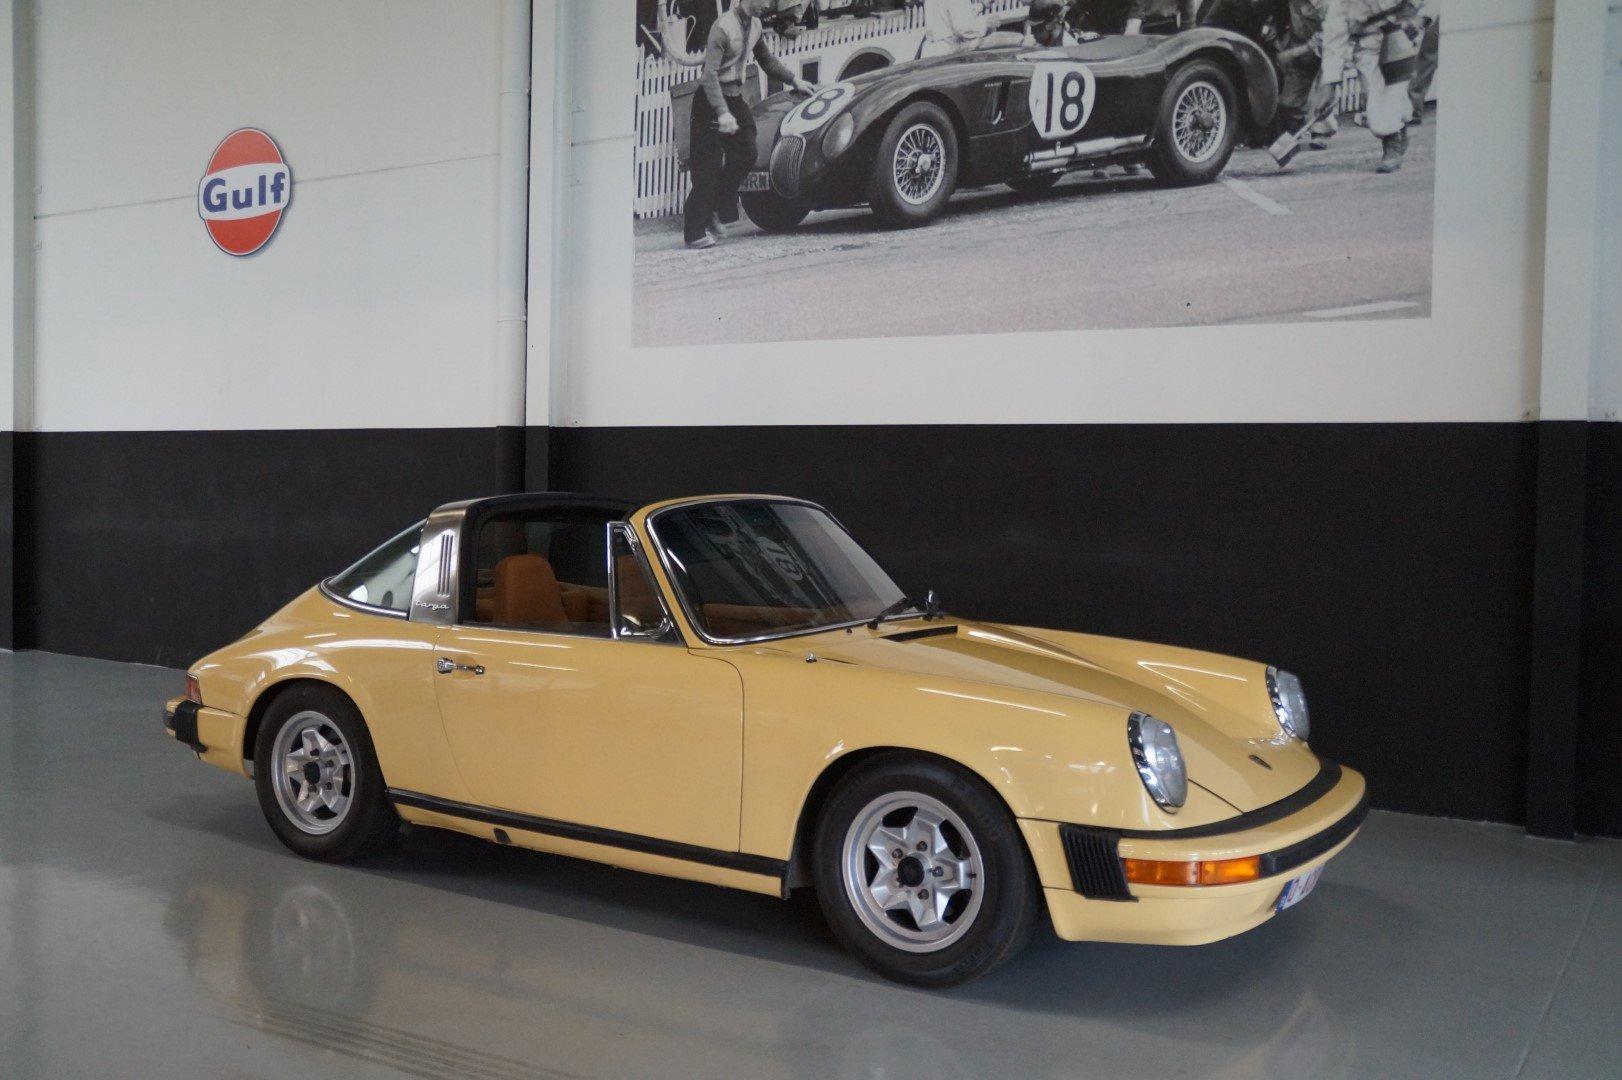 PORSCHE 911 911S 2.7 Targa Rare Colour Combination (1974) For Sale (picture 1 of 6)